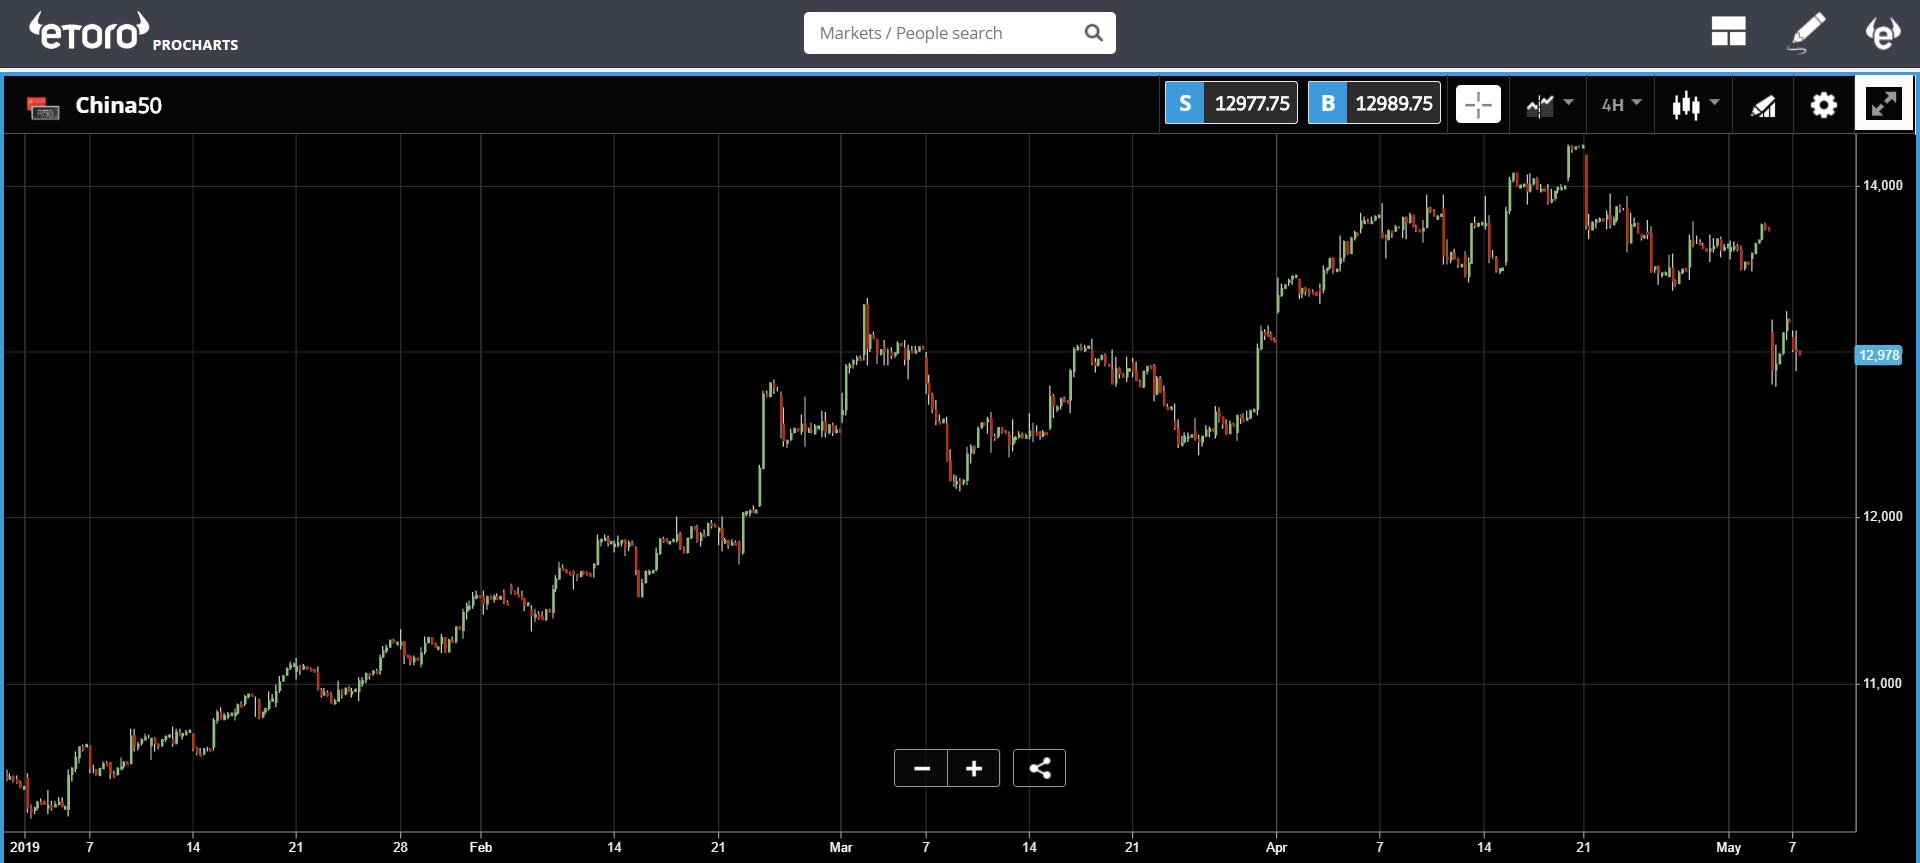 market, trading, cryptocurrency, crypto., bitcoin, blockchain, ethereum, stocks,